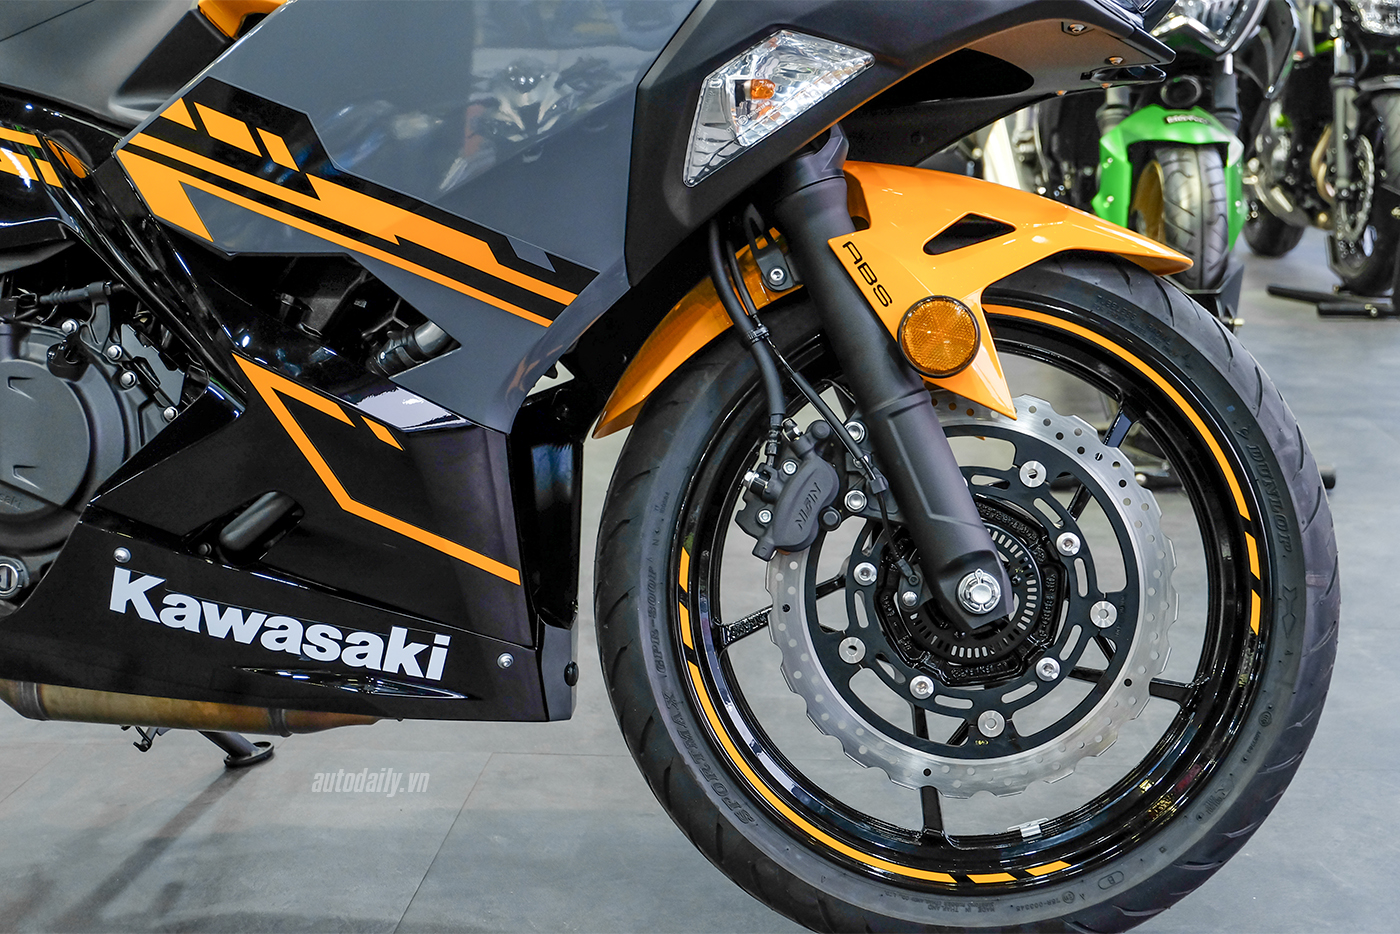 kawasaki-ninja-400-6.jpg